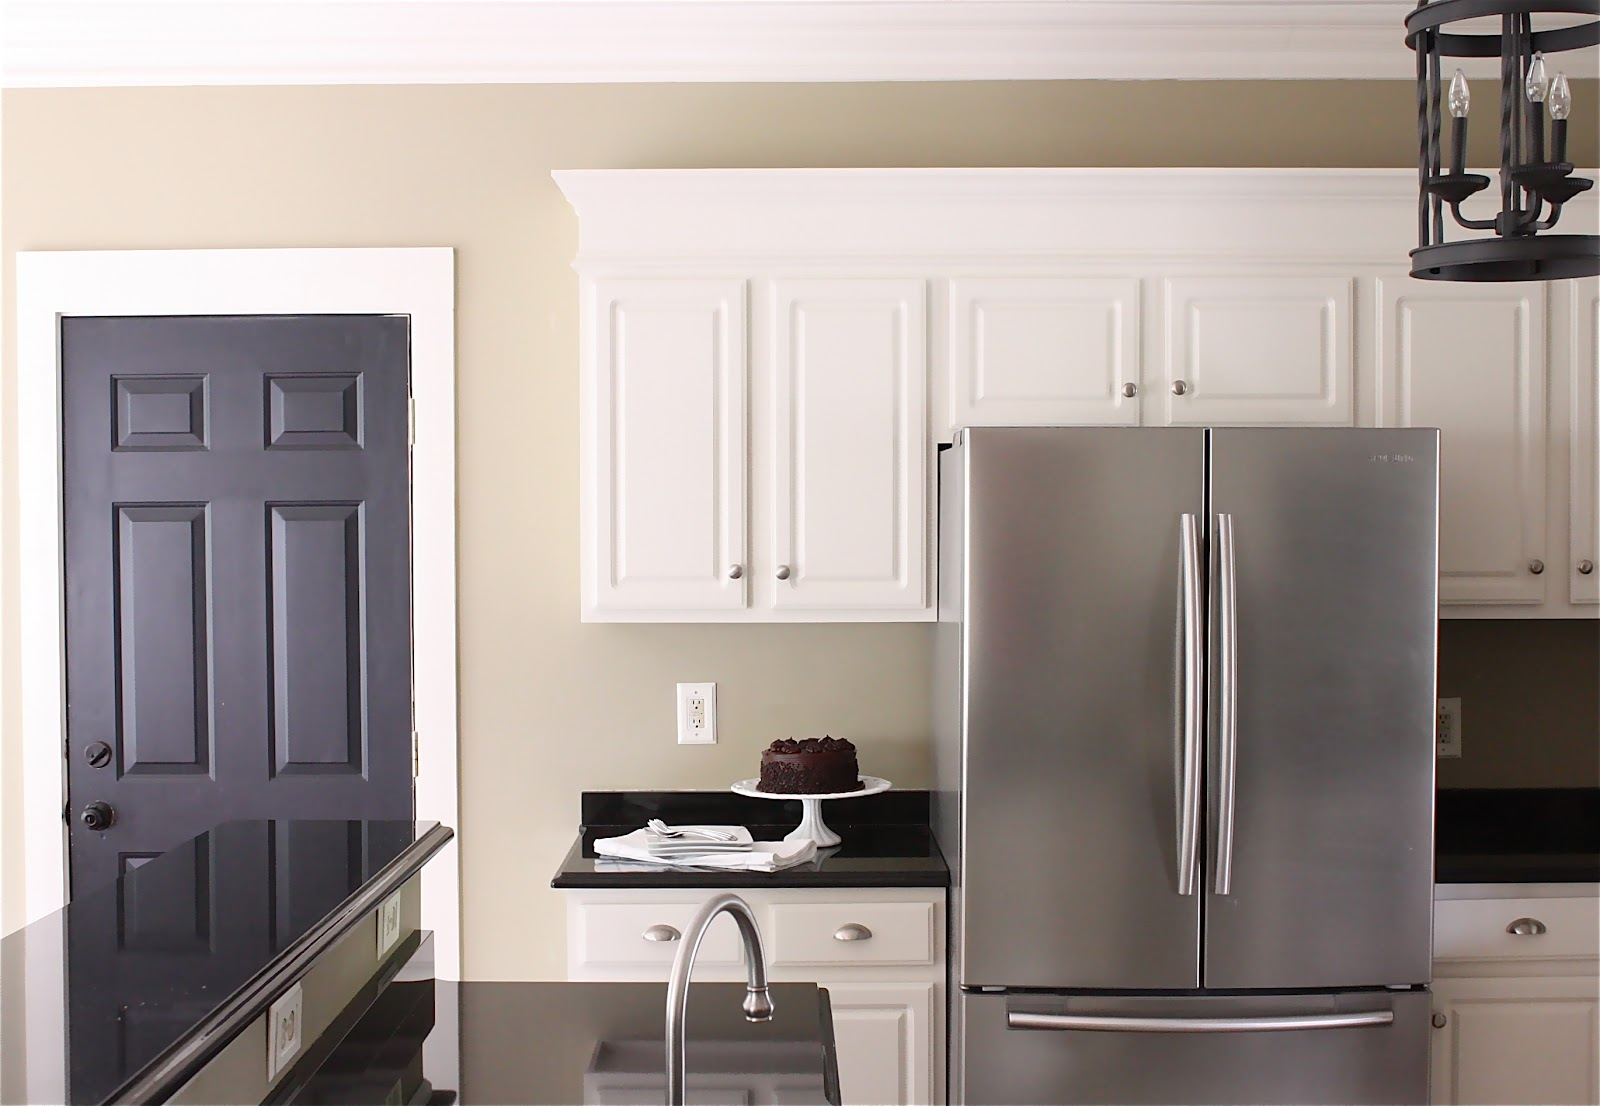 kitchen ideas Best Kitchen Painting Ideas The Best Paint